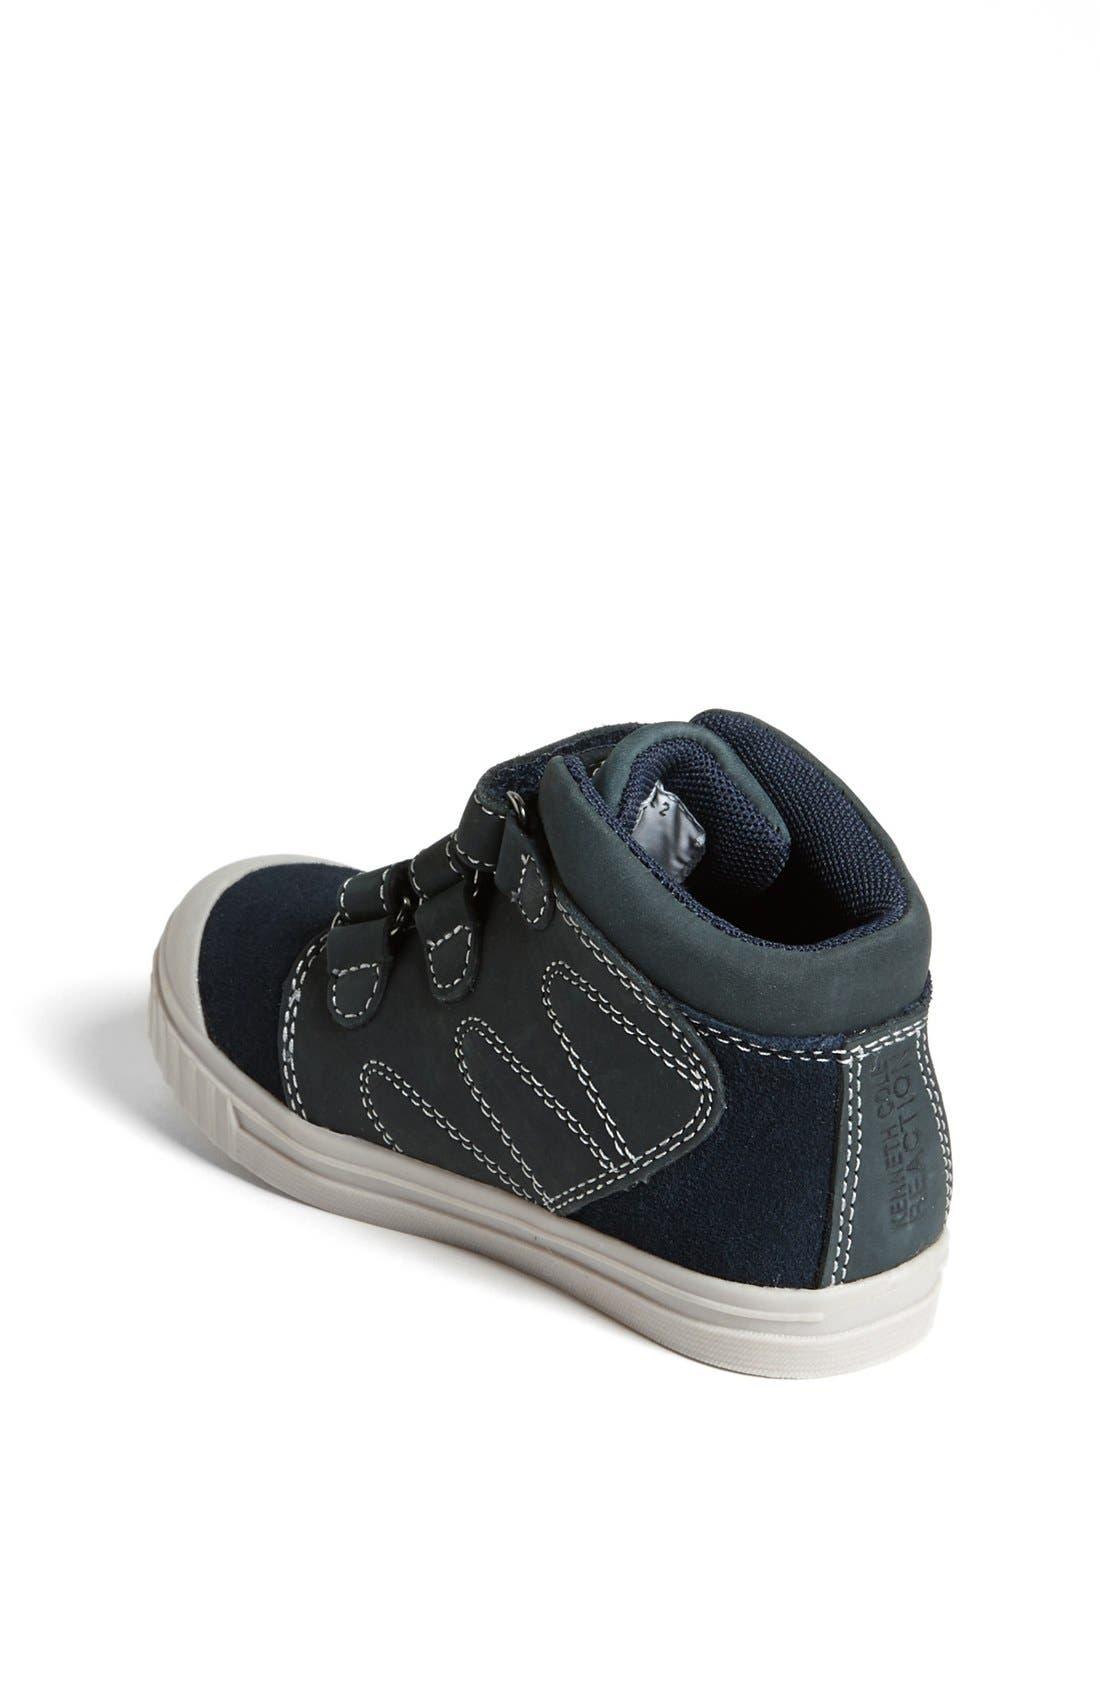 Alternate Image 2  - Kenneth Cole Reaction 'Take Its Roll 2' Sneaker (Walker & Toddler)